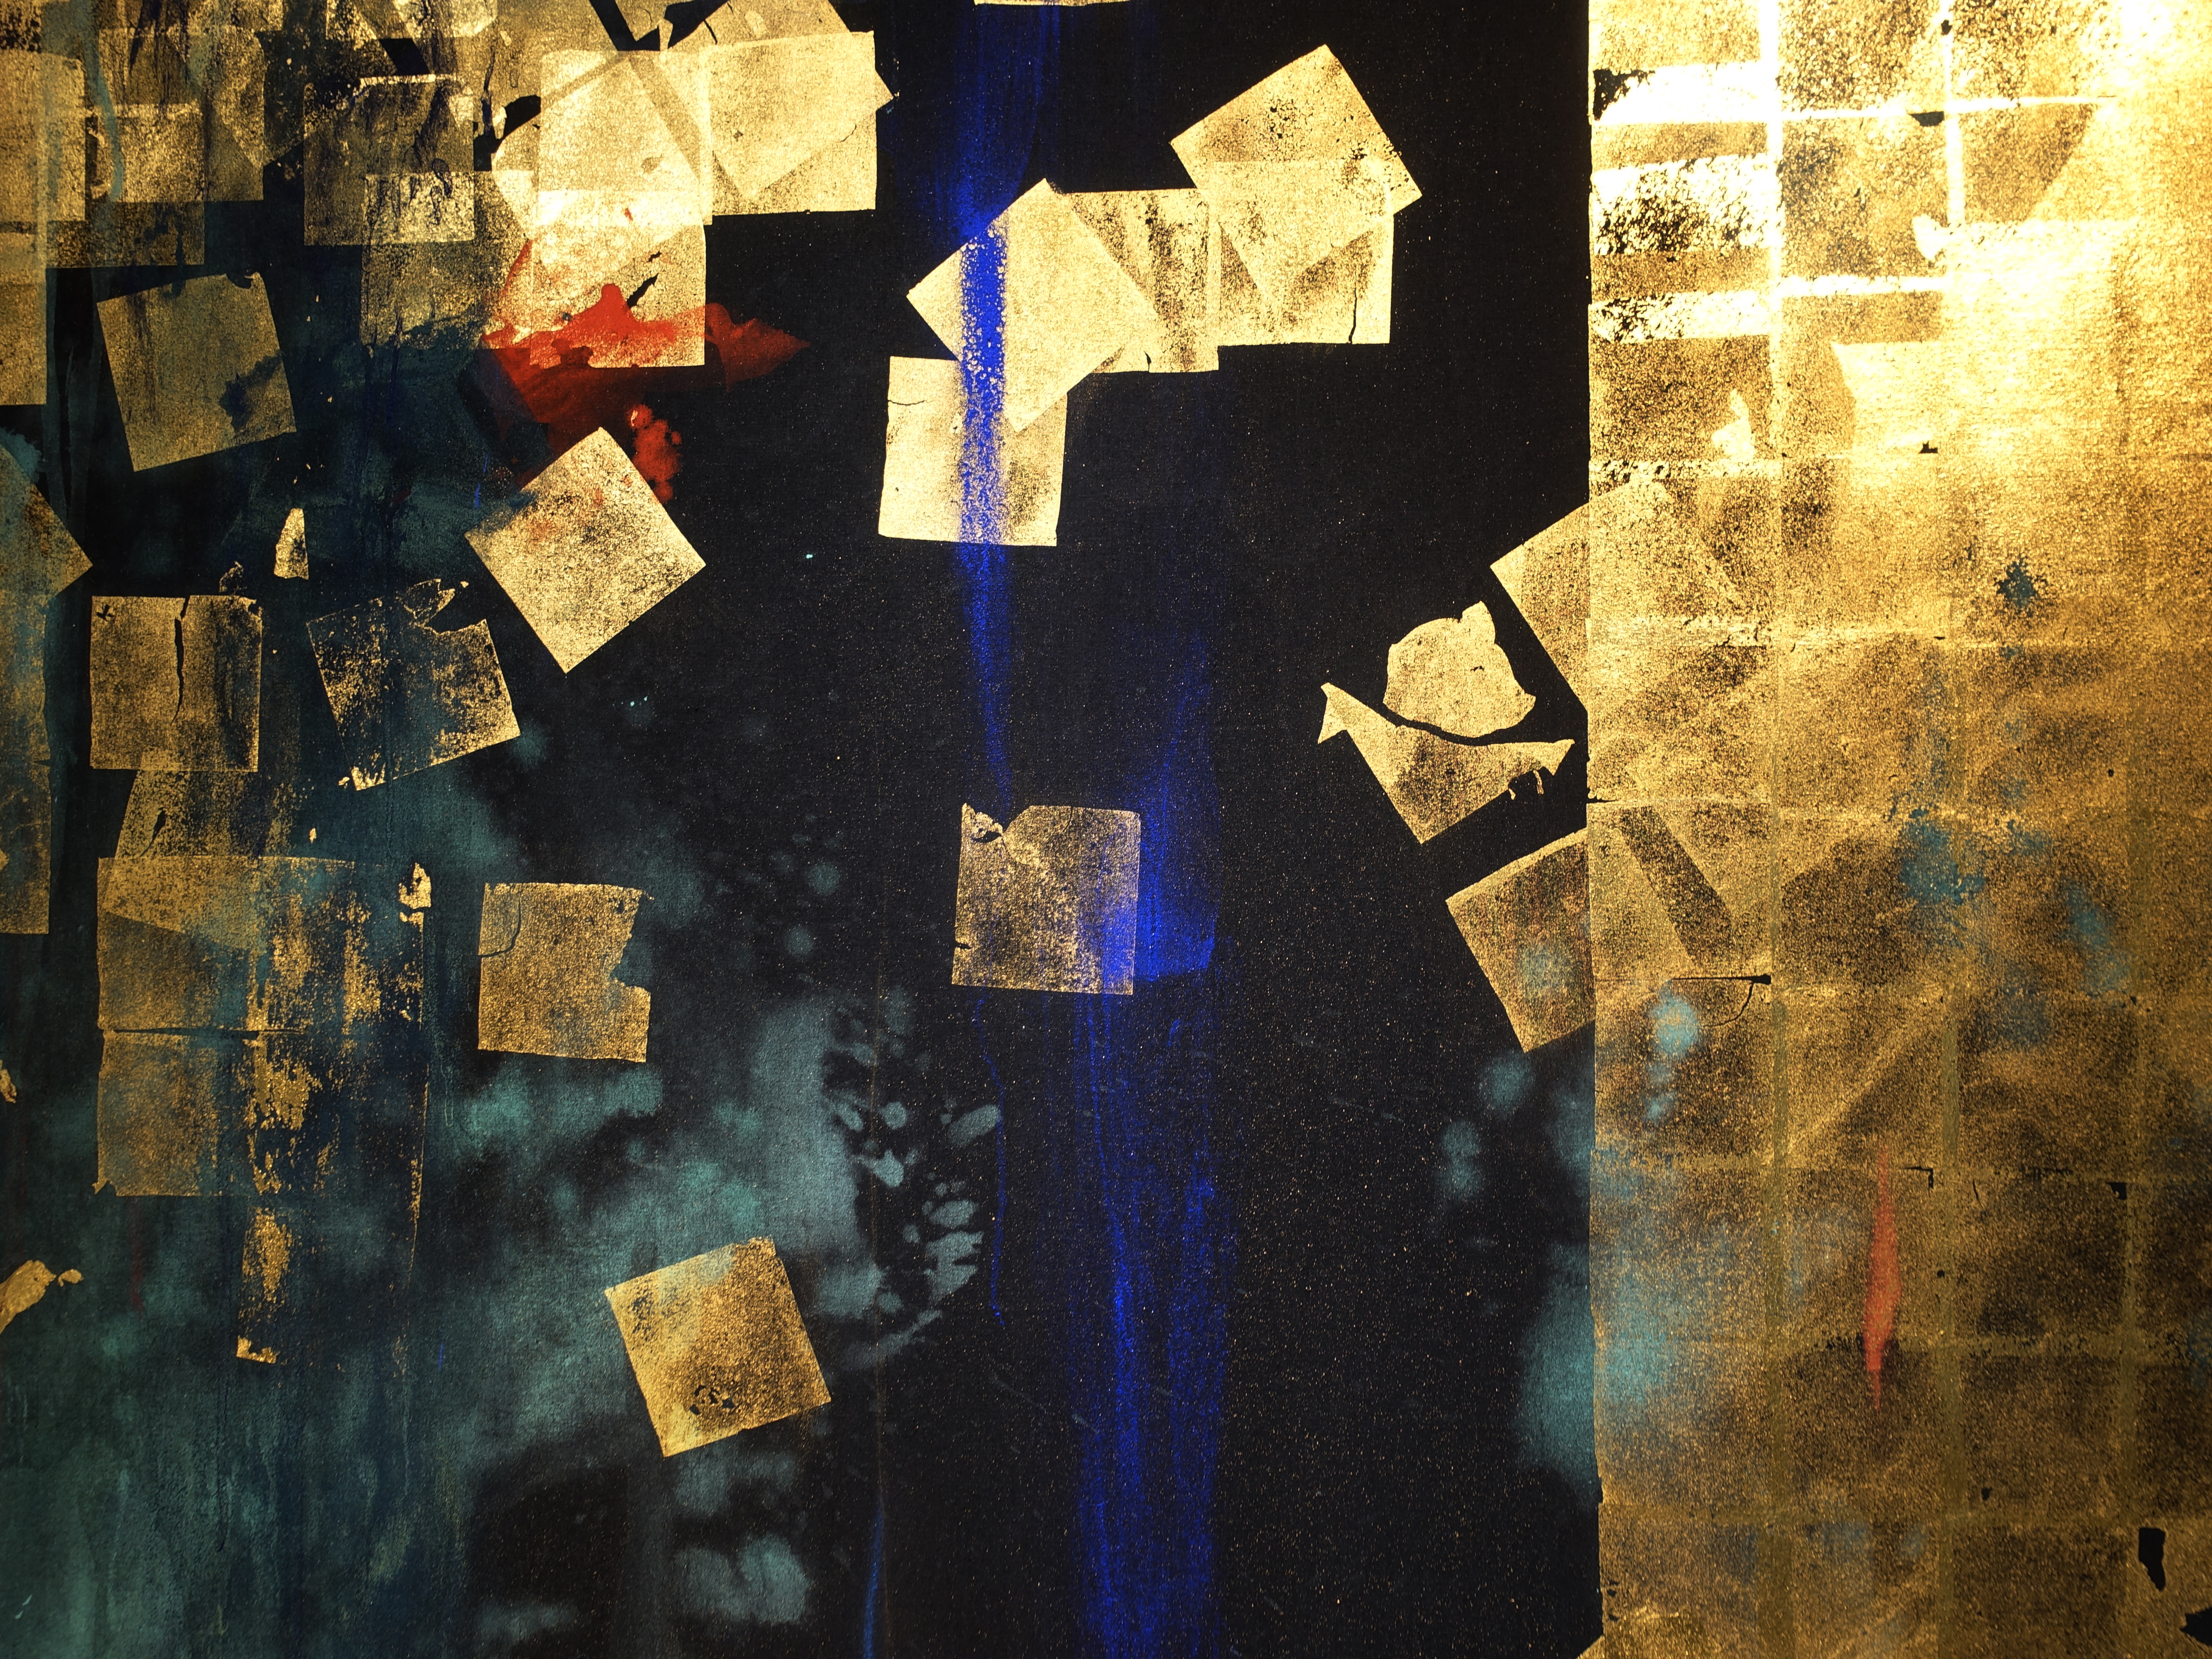 Makoto Fujimura,《Soliloquies - Joy》細節,203 x 163 cm,天然礦物顏料、金箔、比利時亞麻畫布,2009。